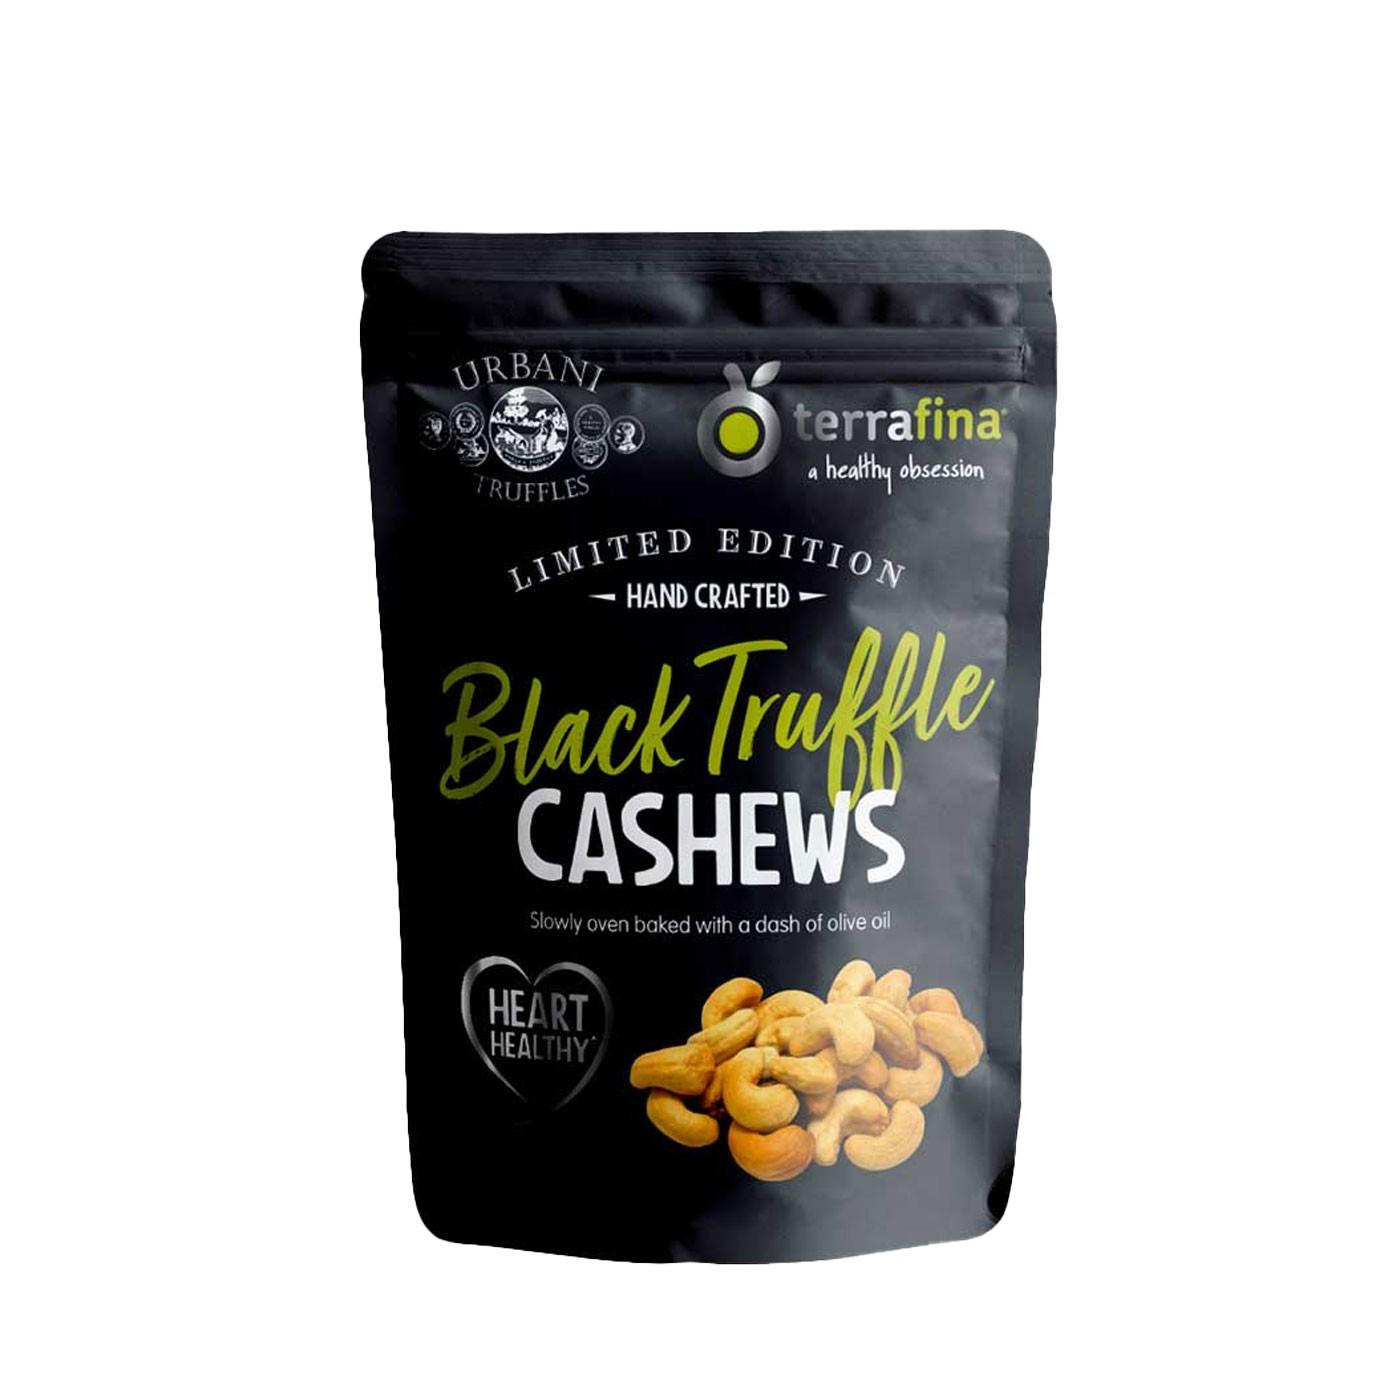 Black Truffle Cashews 4 oz